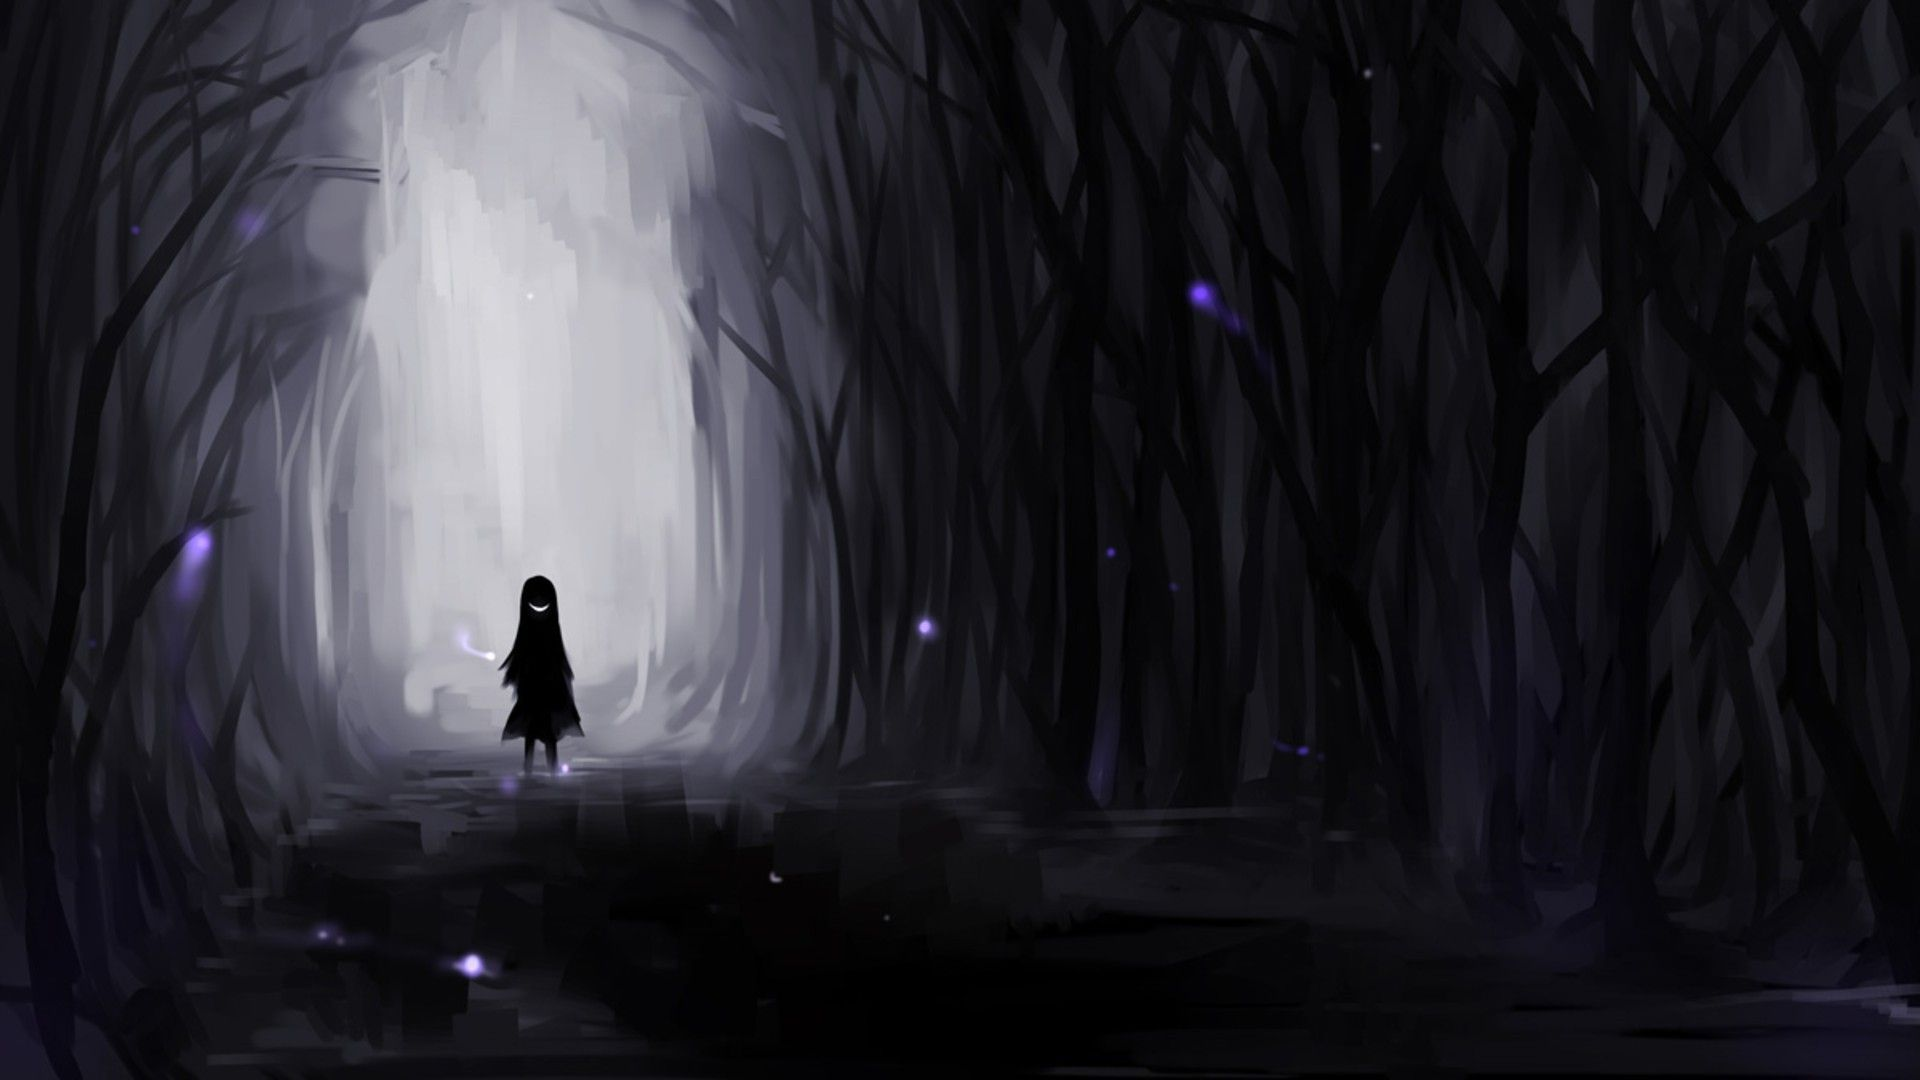 Dark Forest 1980x1080 Animewallpaper Papel De Parede Escuro Anime Negra Papel De Parede Floresta